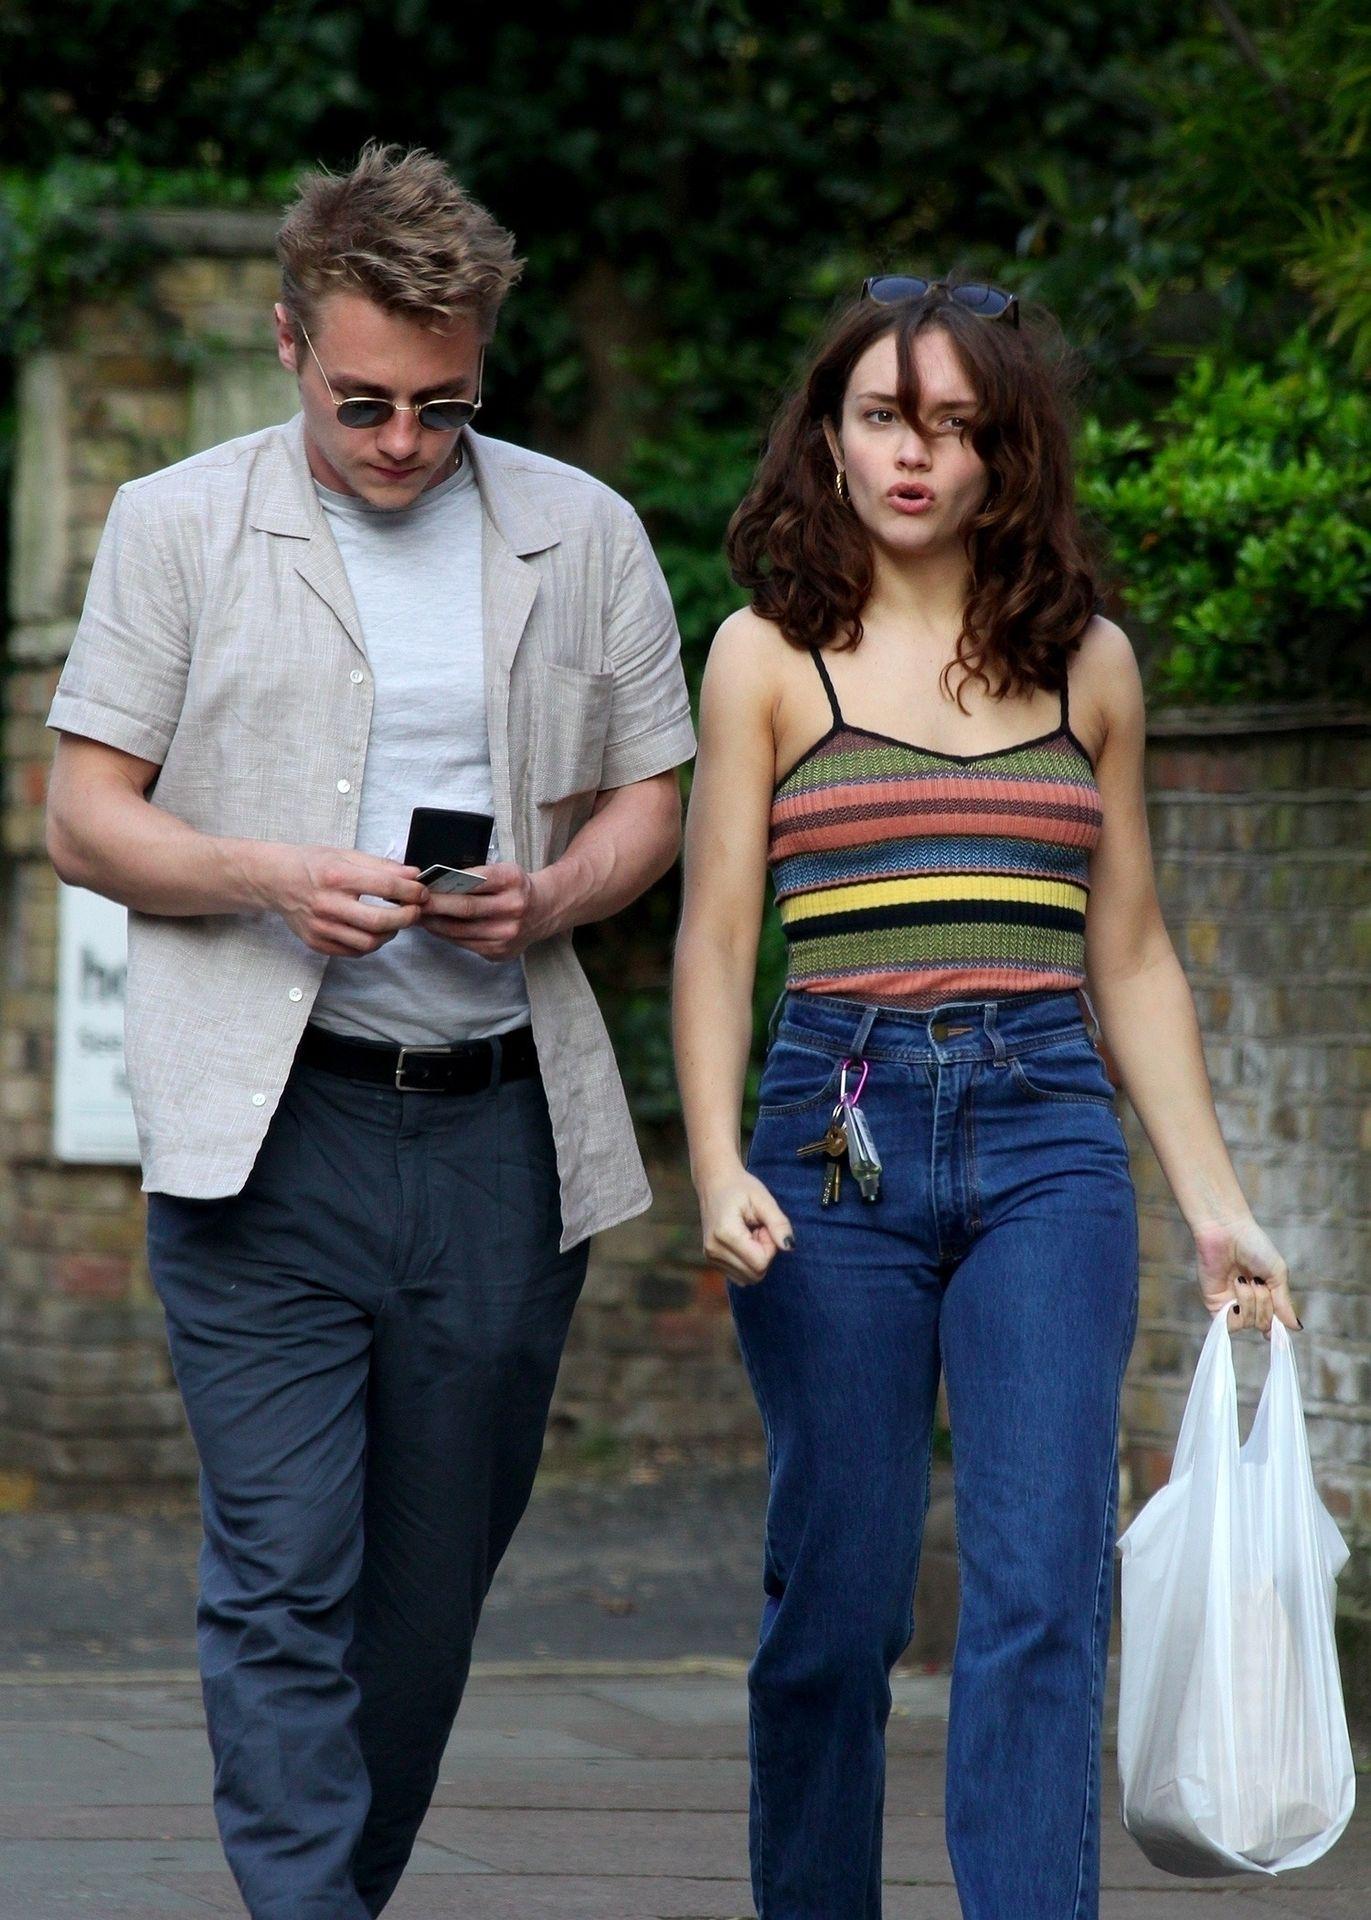 Ben Hardy Walks Hand In Hand With Actress Girlfriend Olivia Cooke 0011